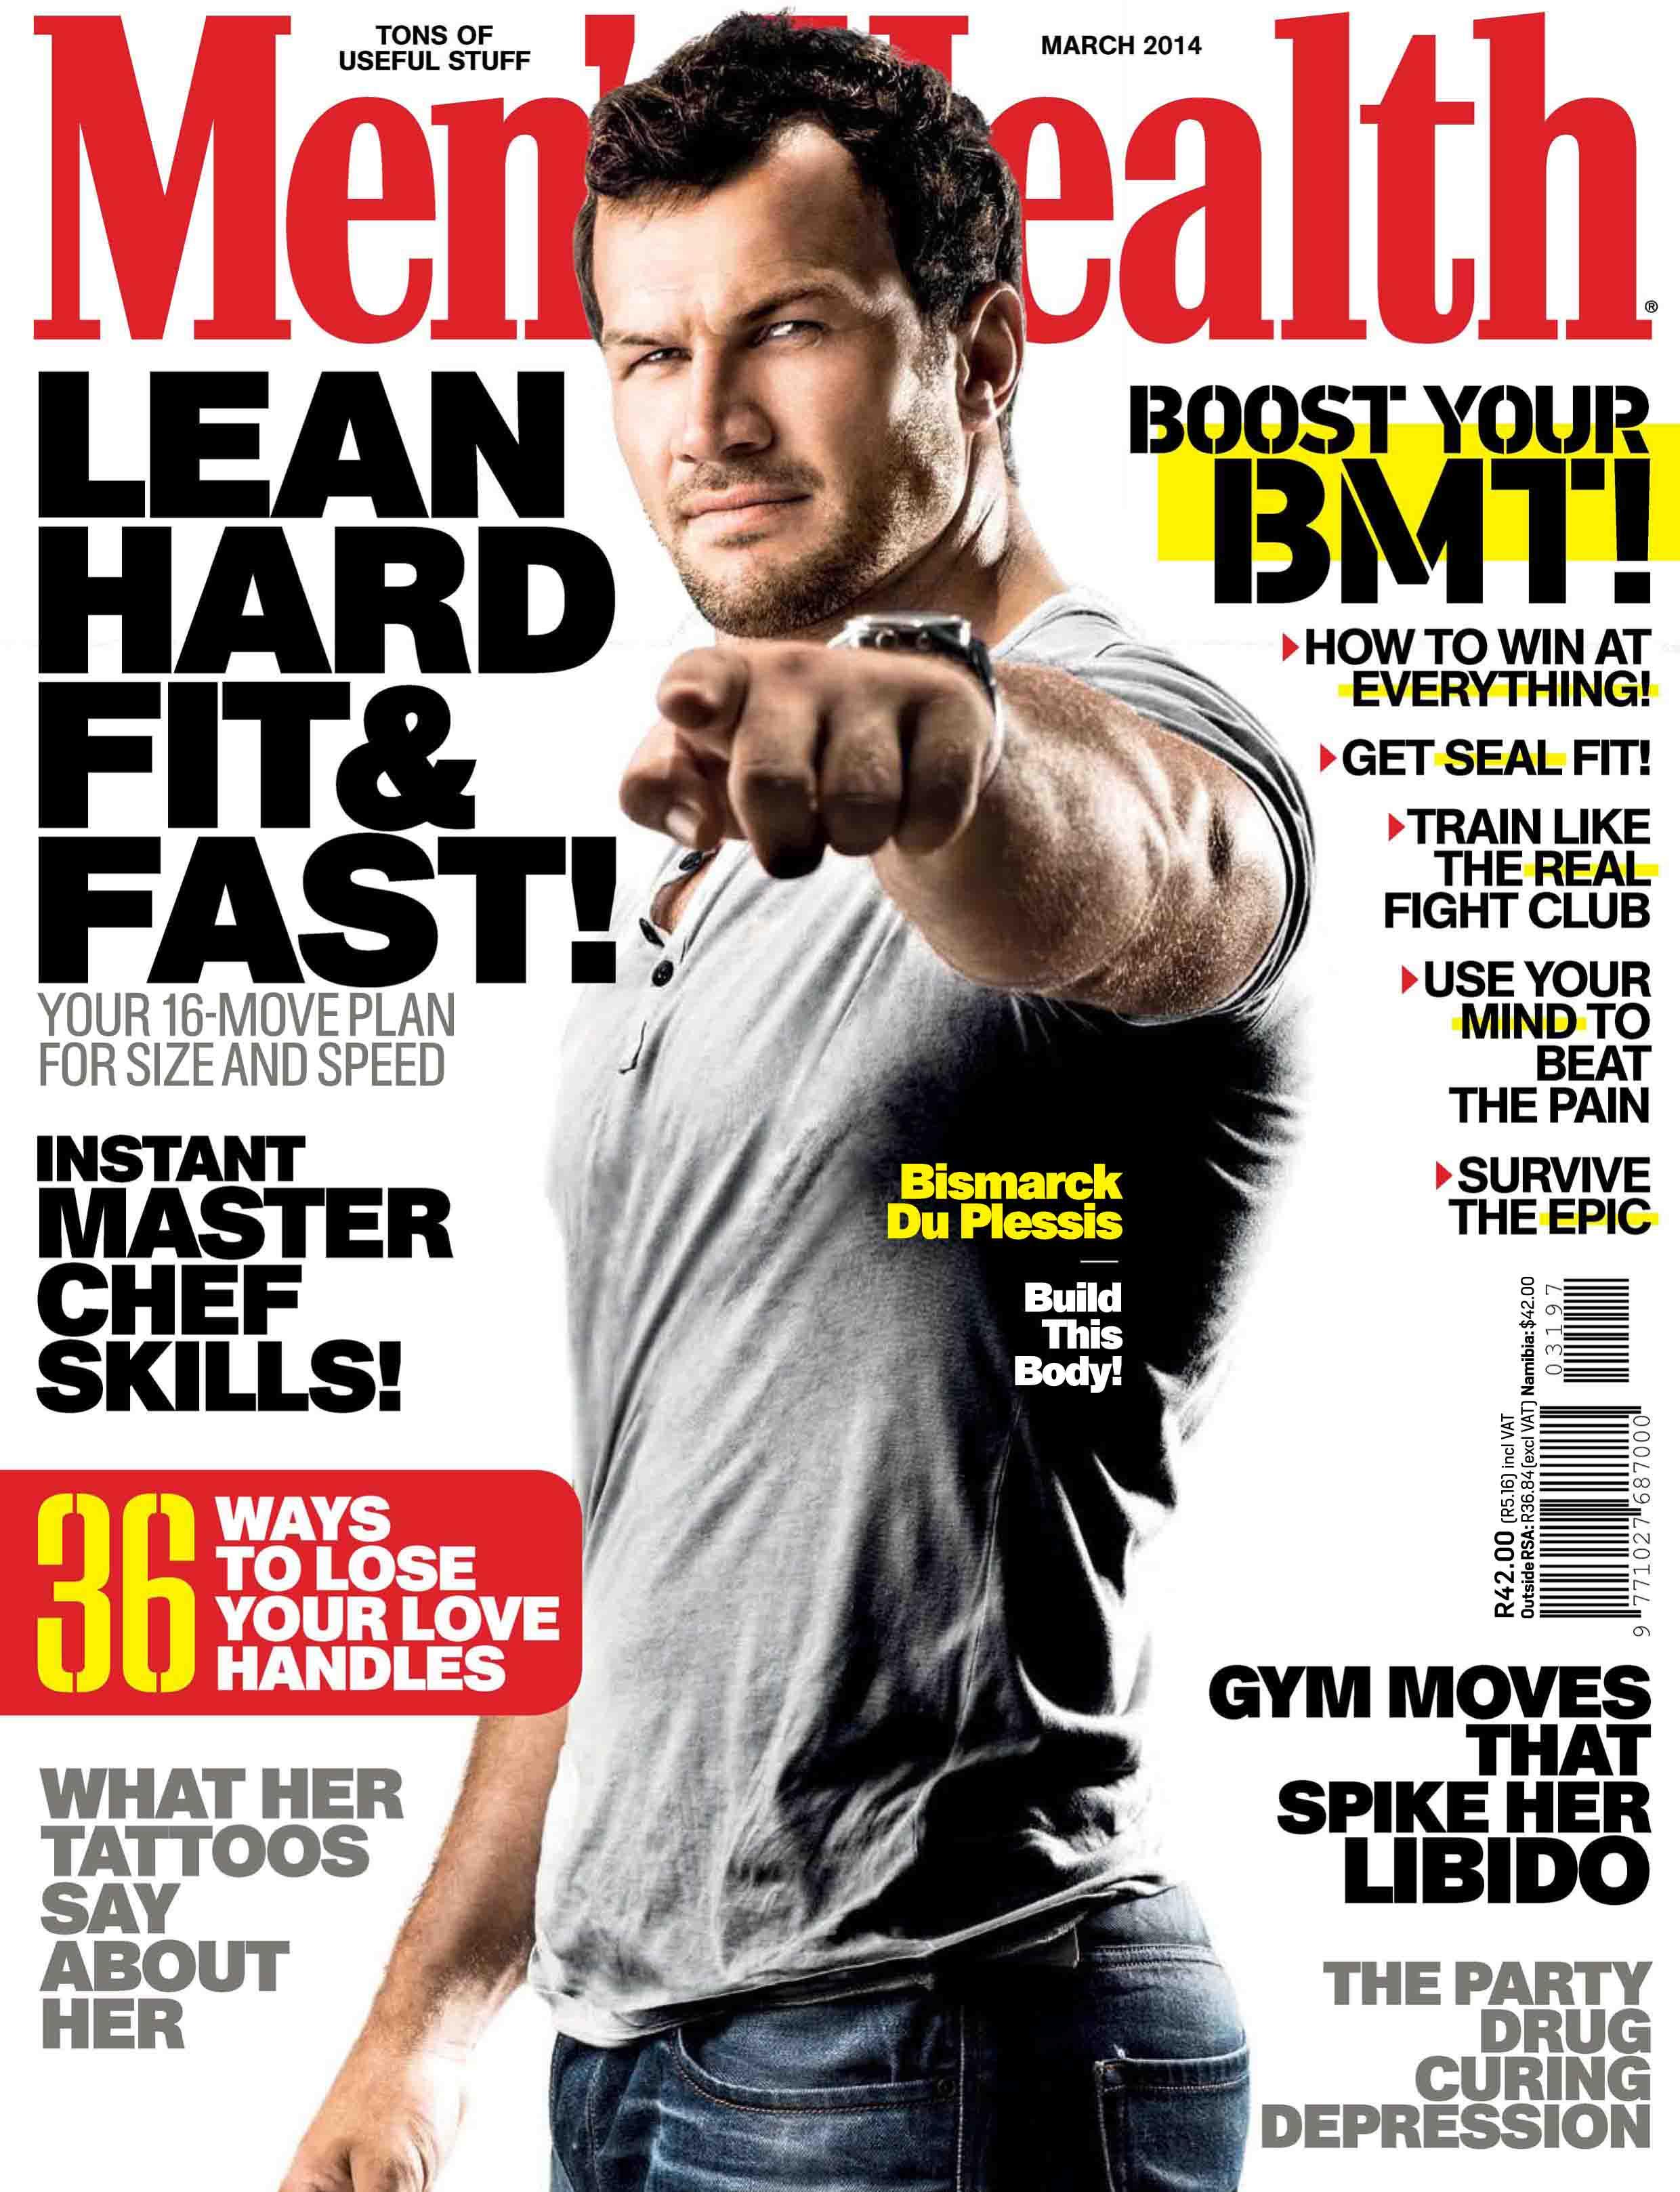 Mens Health Magazine President Barack Obama Instant Energy: Famousmales > Rugby Player Bismarck Du Plessis Naked In